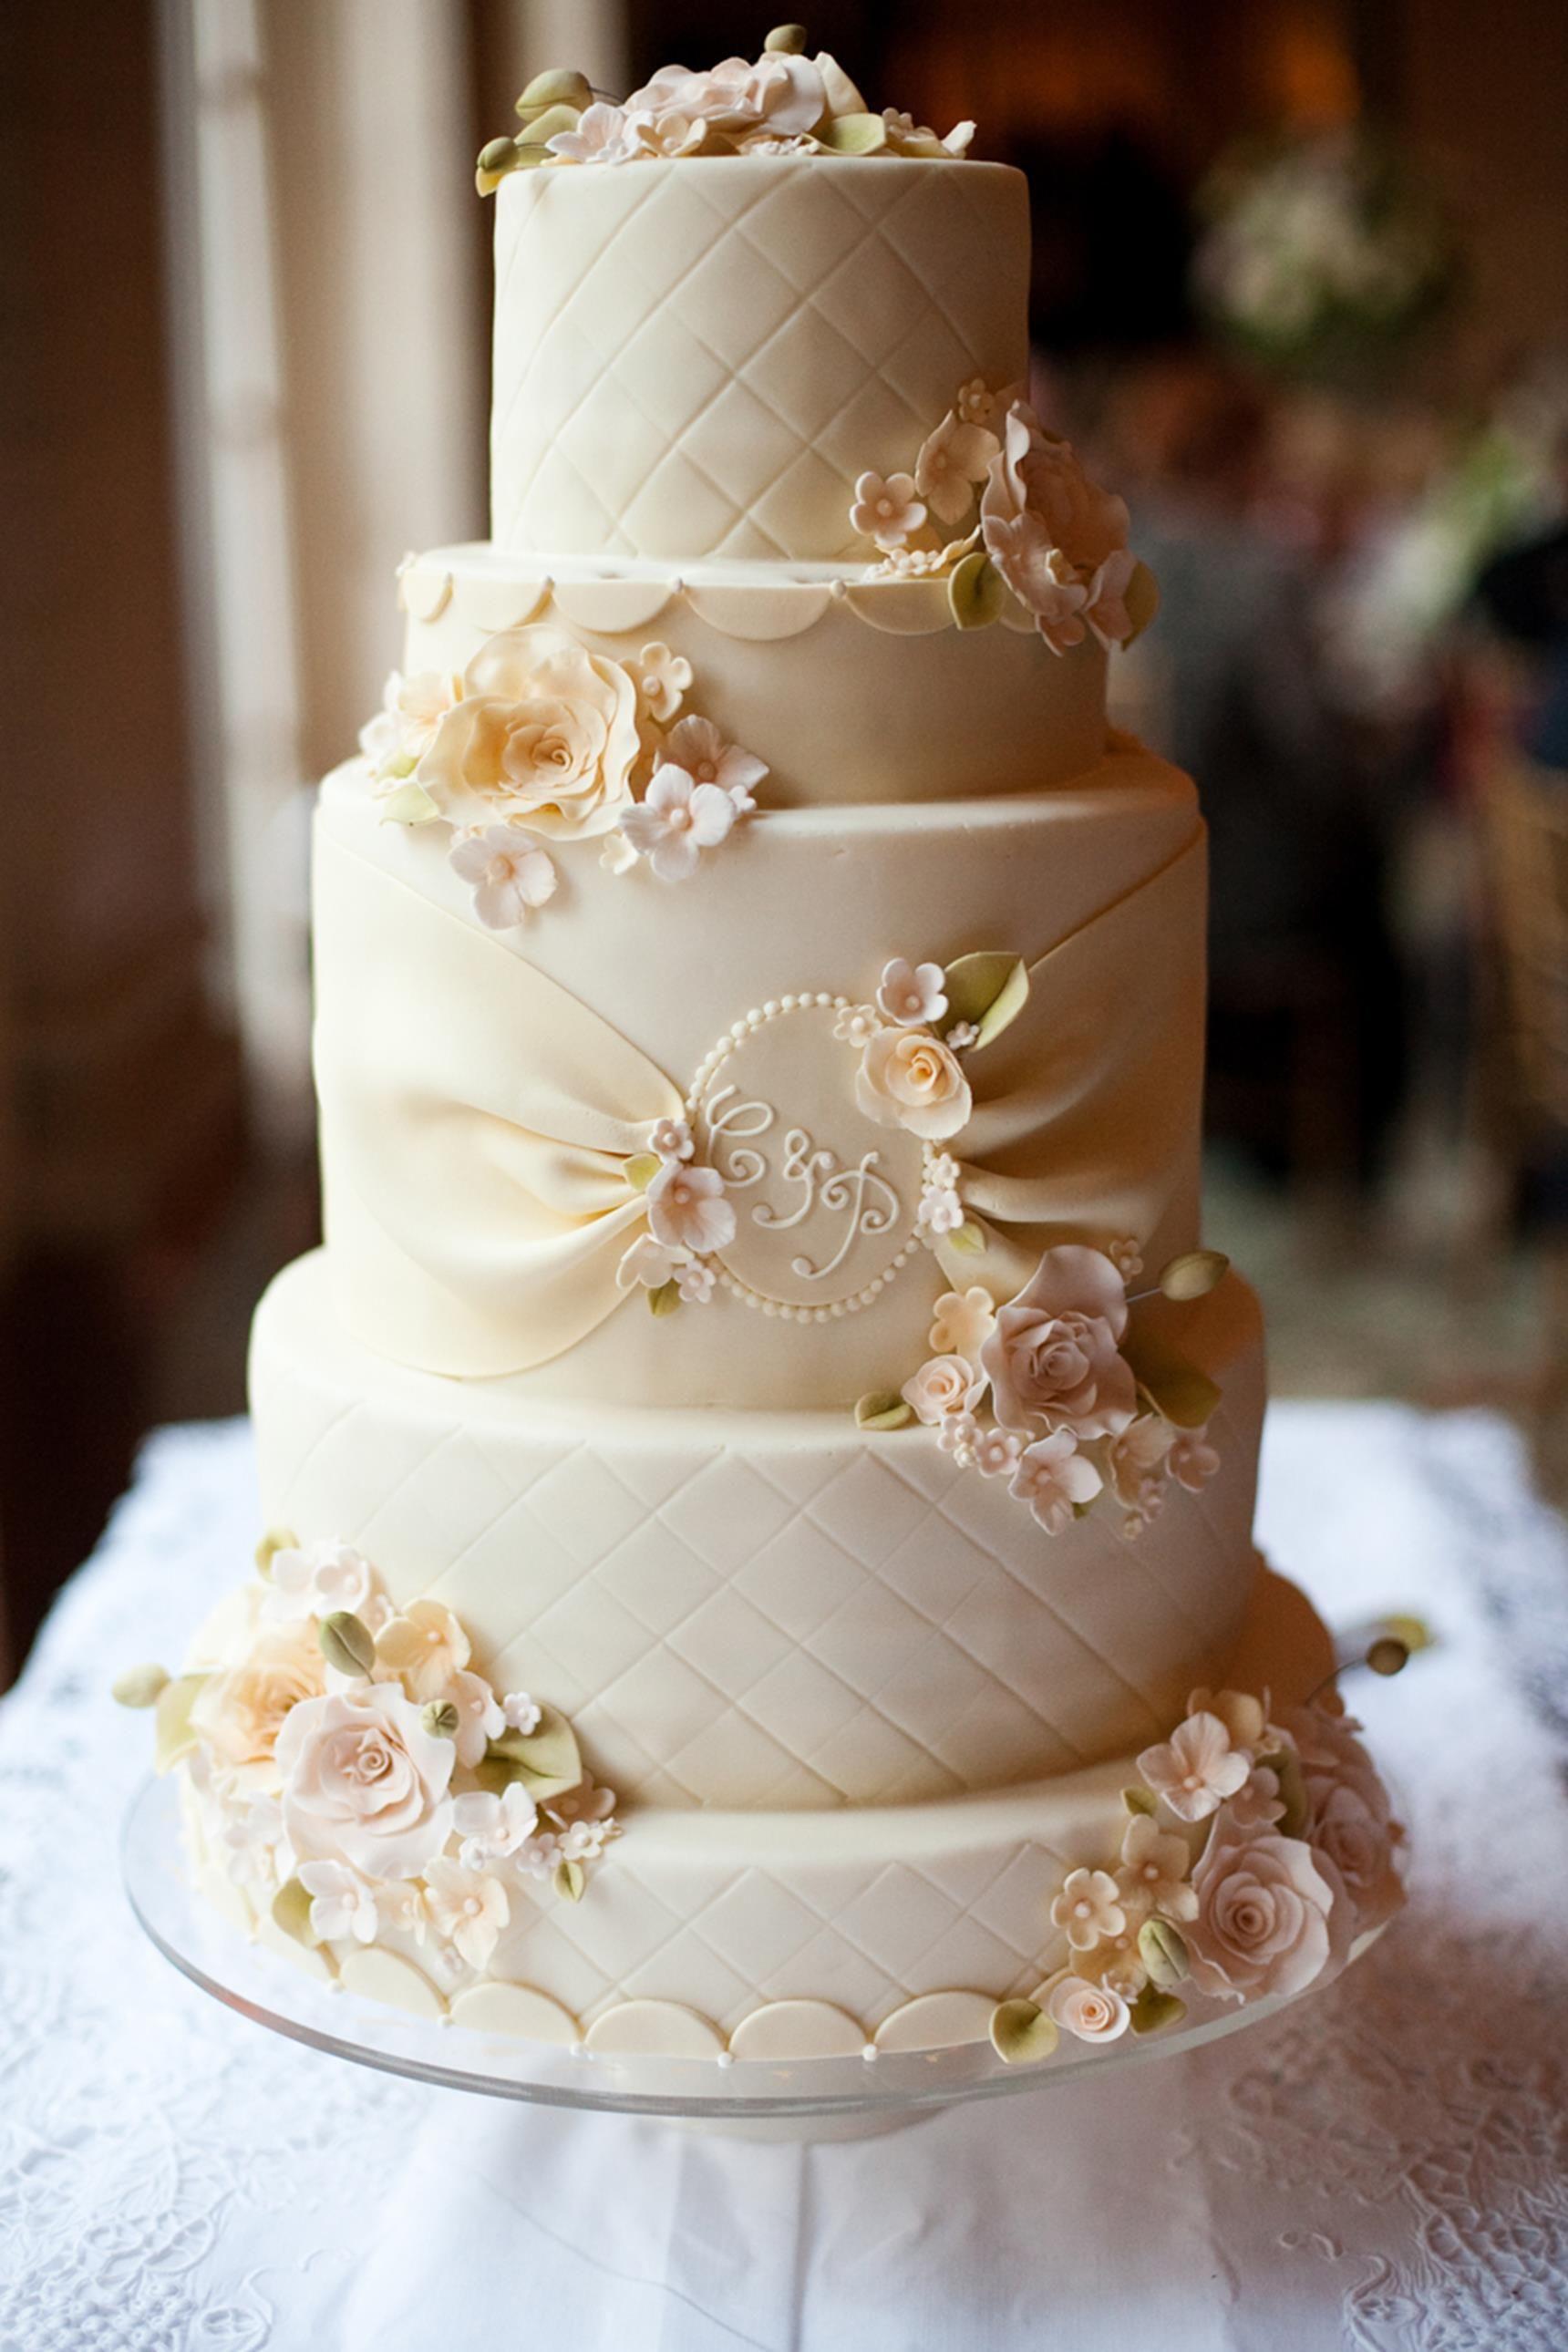 Wedding Cakes prices in goldilocks philippines haydels